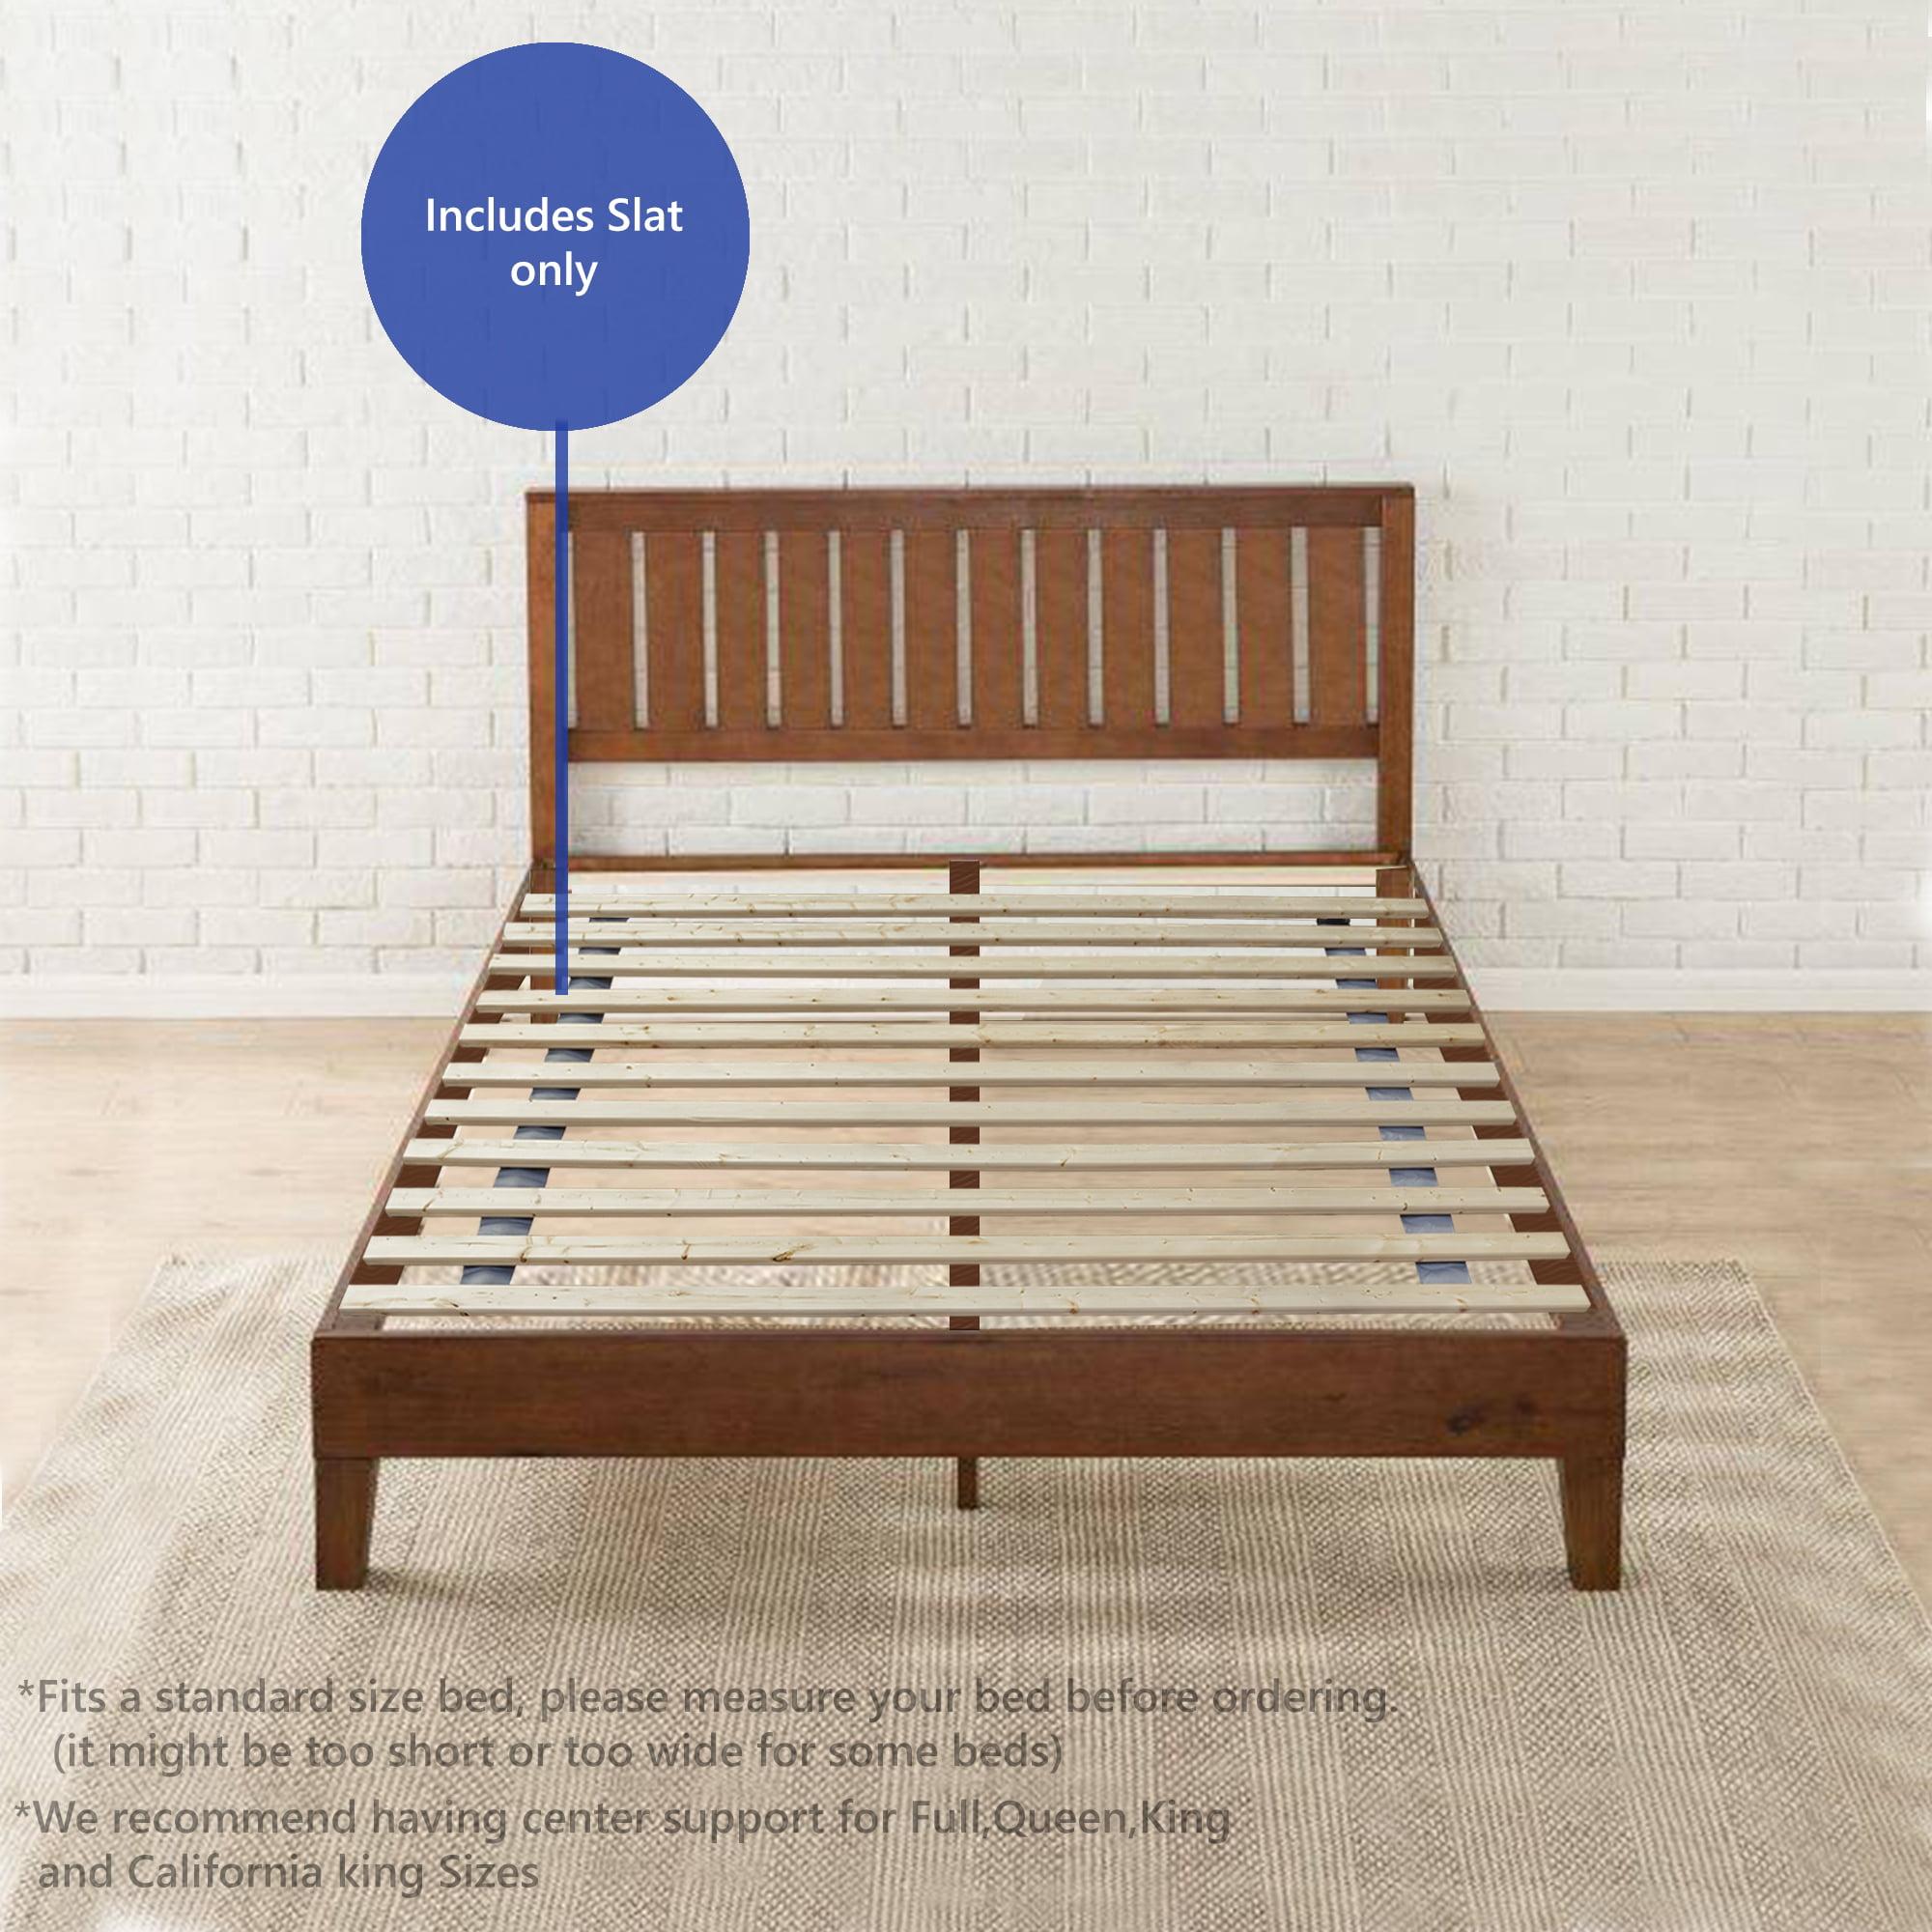 Continental Sleep 1 5 Inch Standard Mattress Support Wooden Bunkie Board Slats Full Size Walmart Com Walmart Com